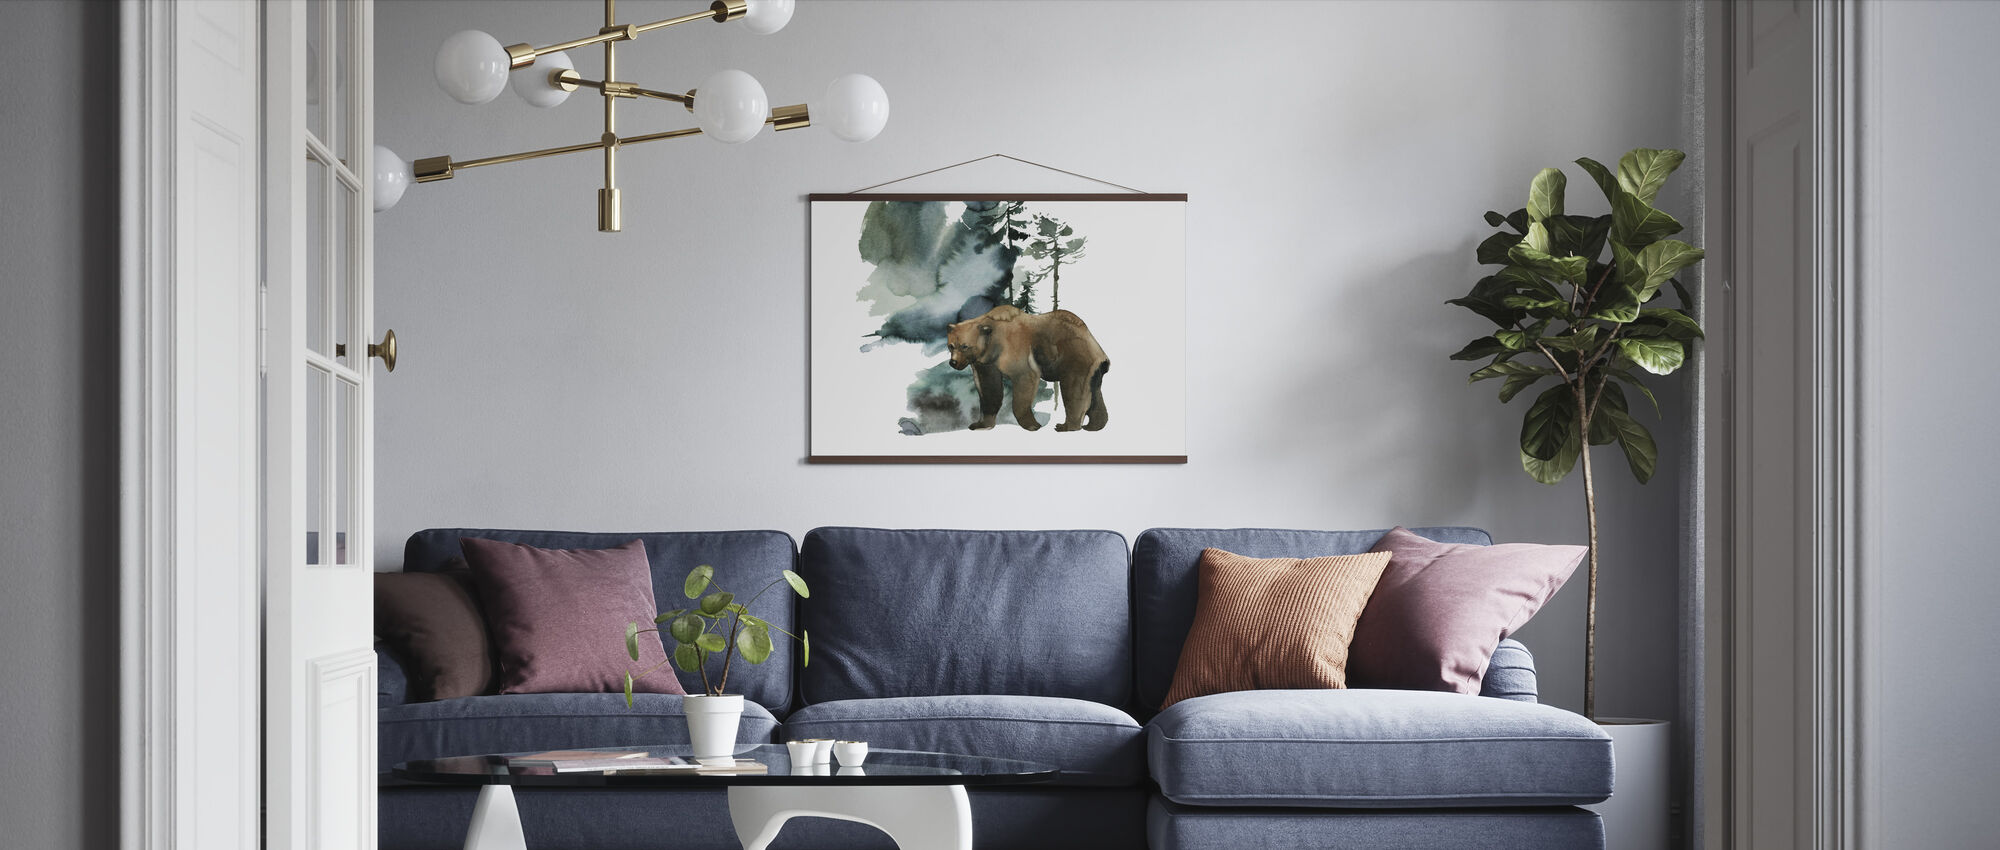 Akvarelli karhunmetsä - Juliste - Olohuone